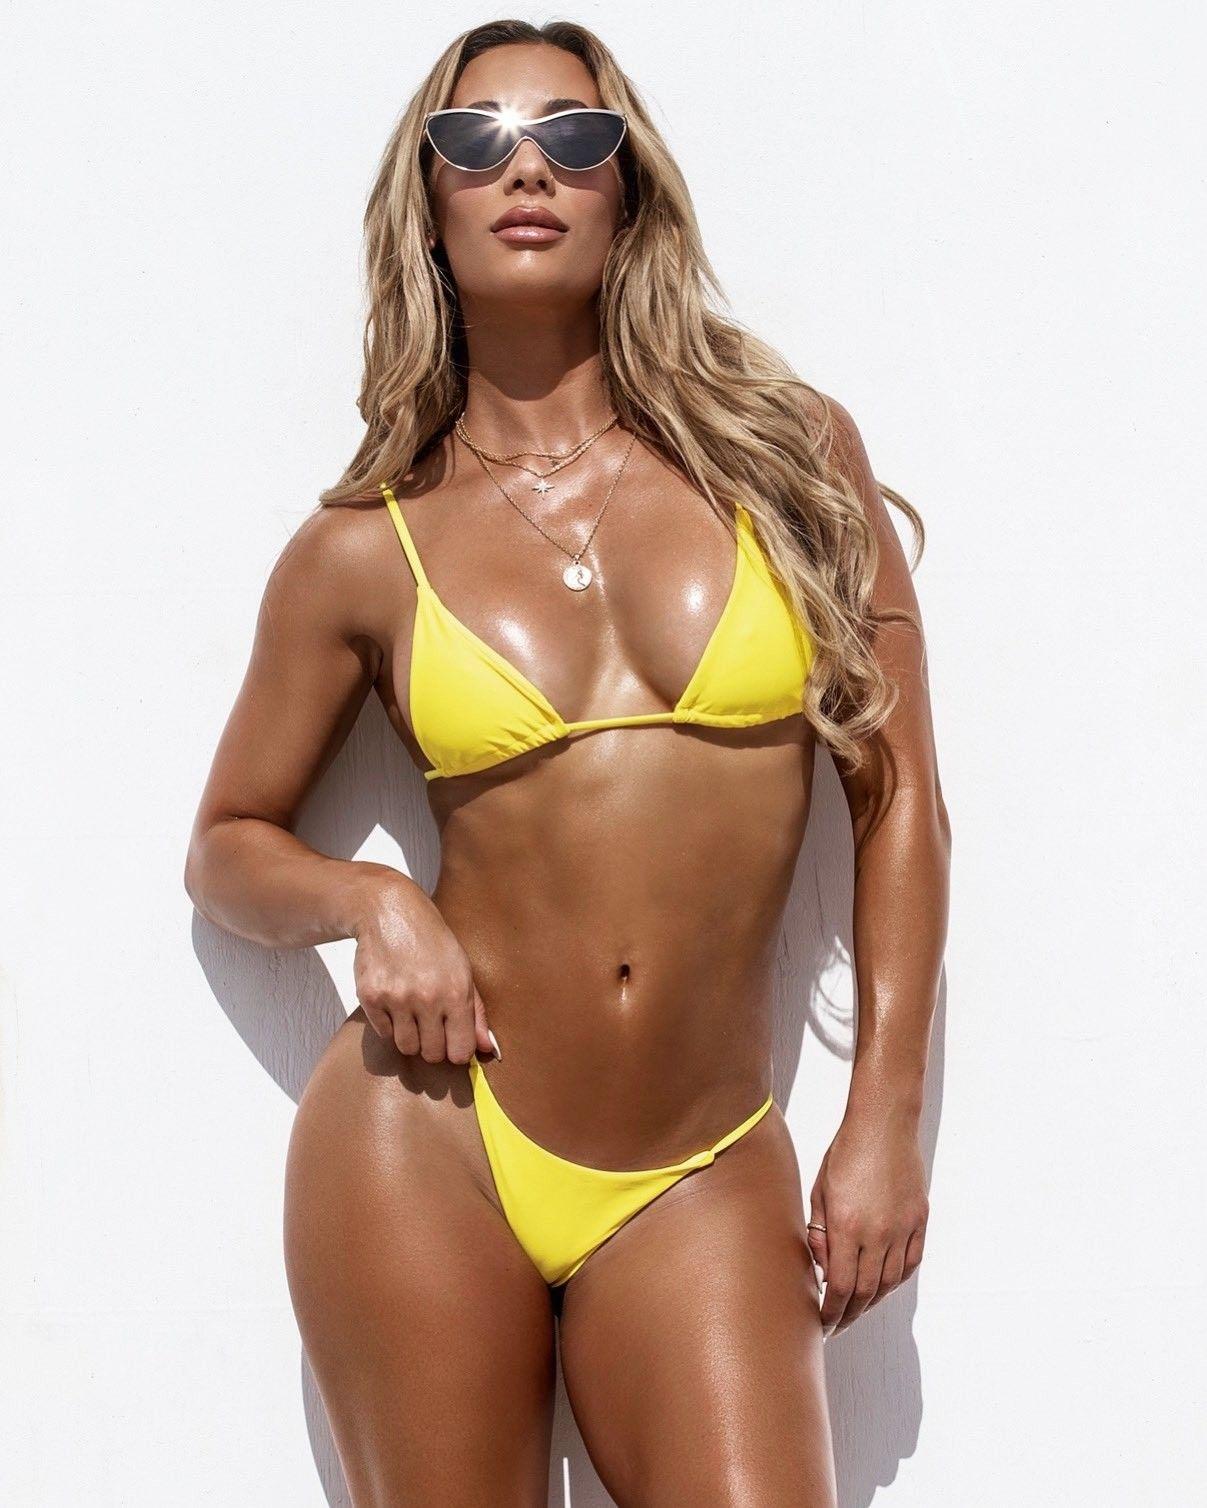 Sexy wwe carmella WWE superstar